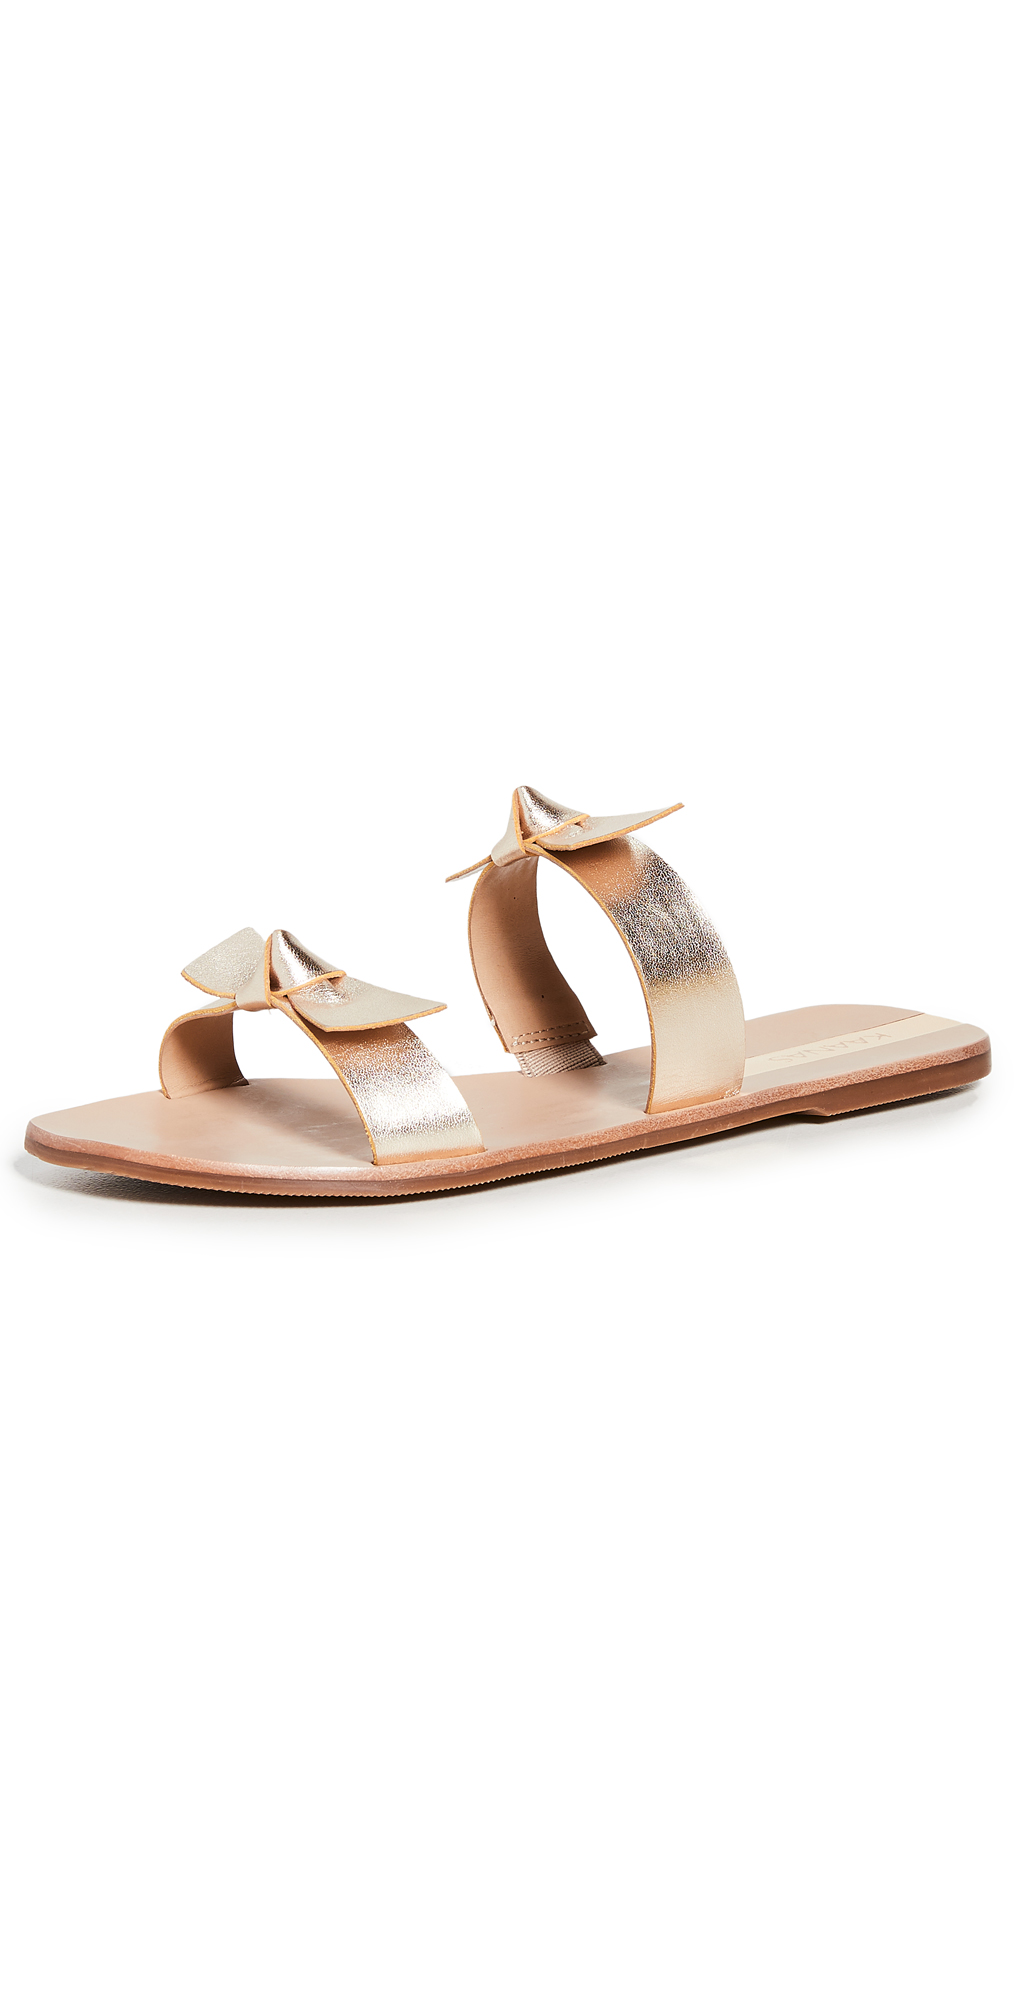 KAANAS Antonia Double Bow Sandals